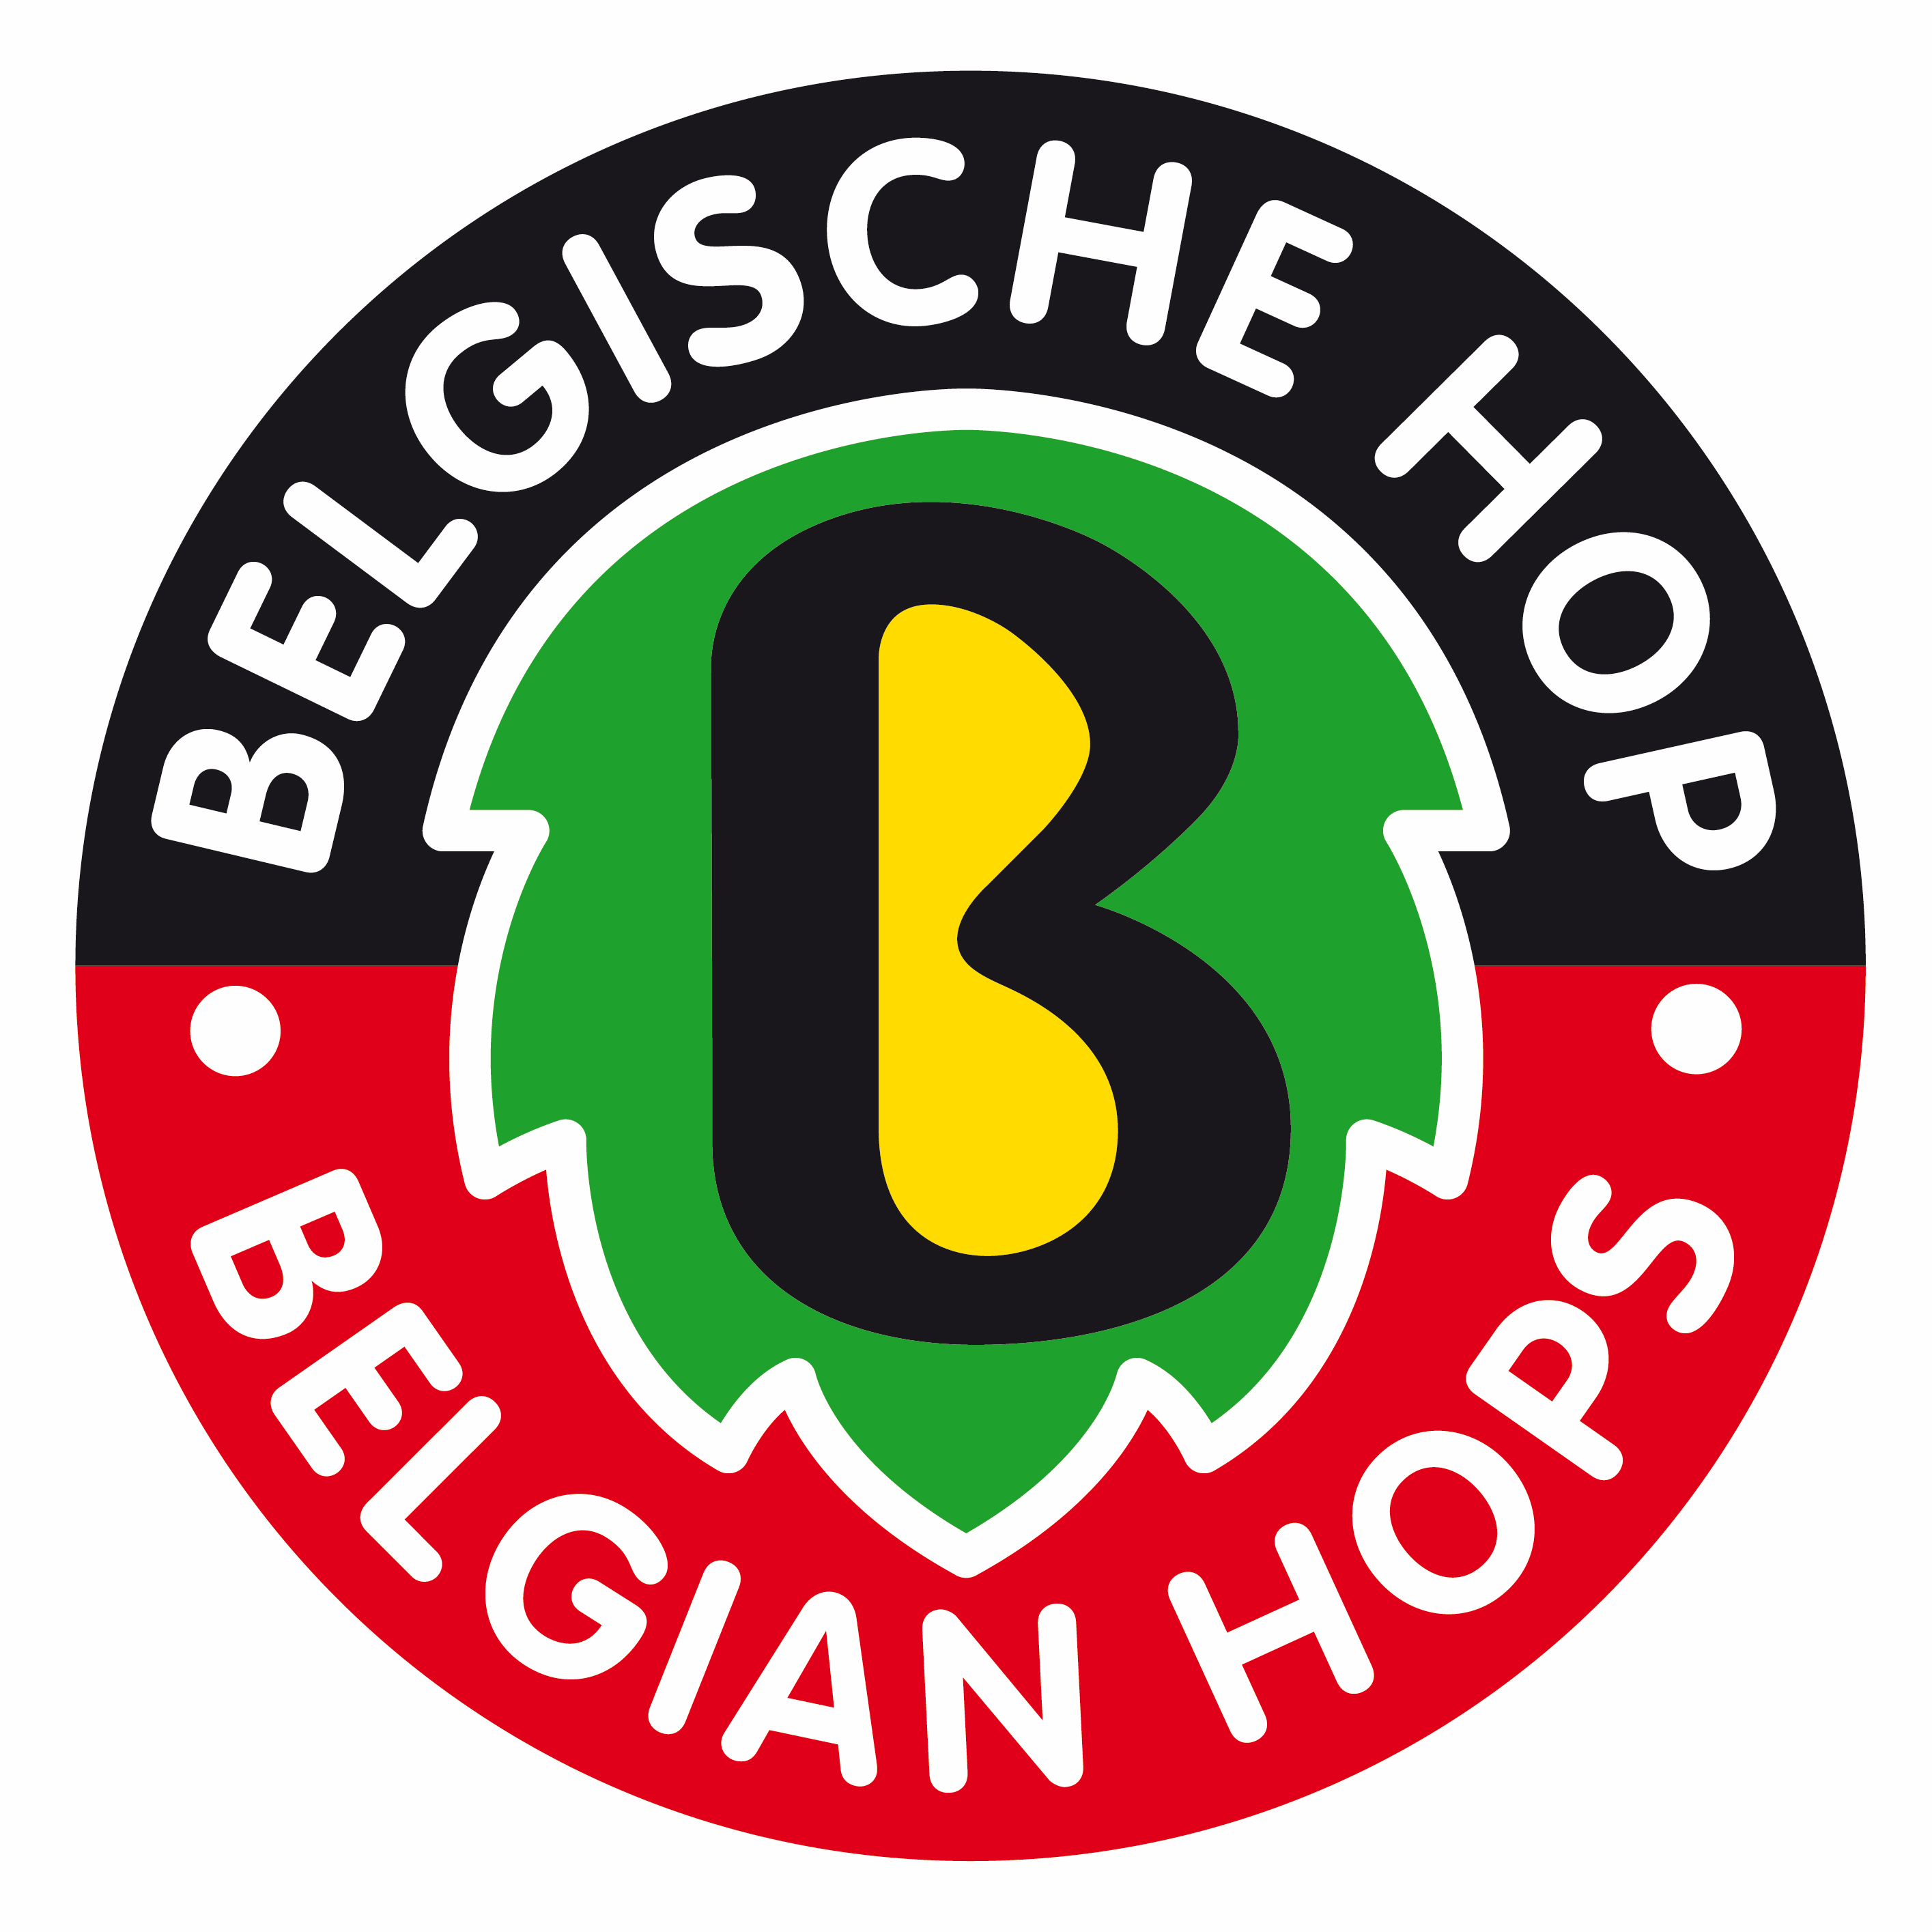 Belgische-Hop_logo_NL-ENG_Q kleiner